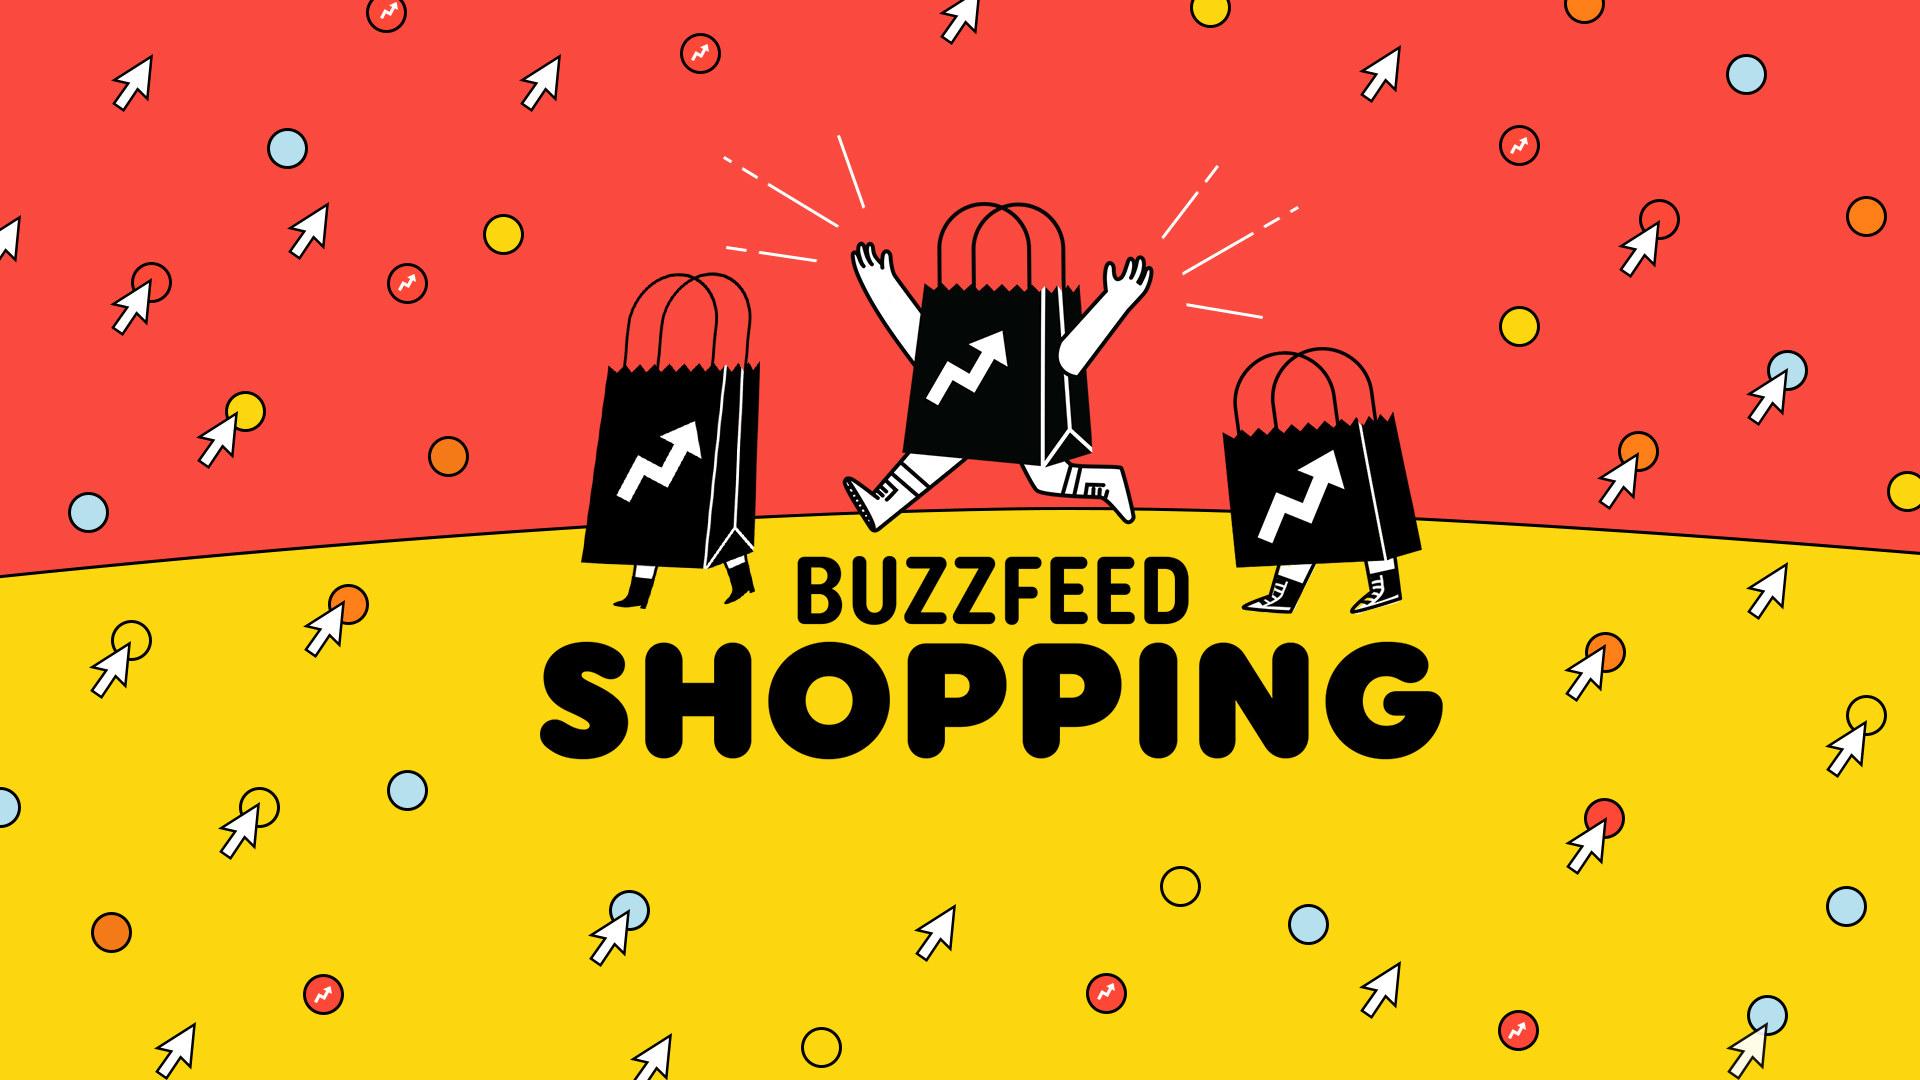 The BuzzFeed Shopping Logo